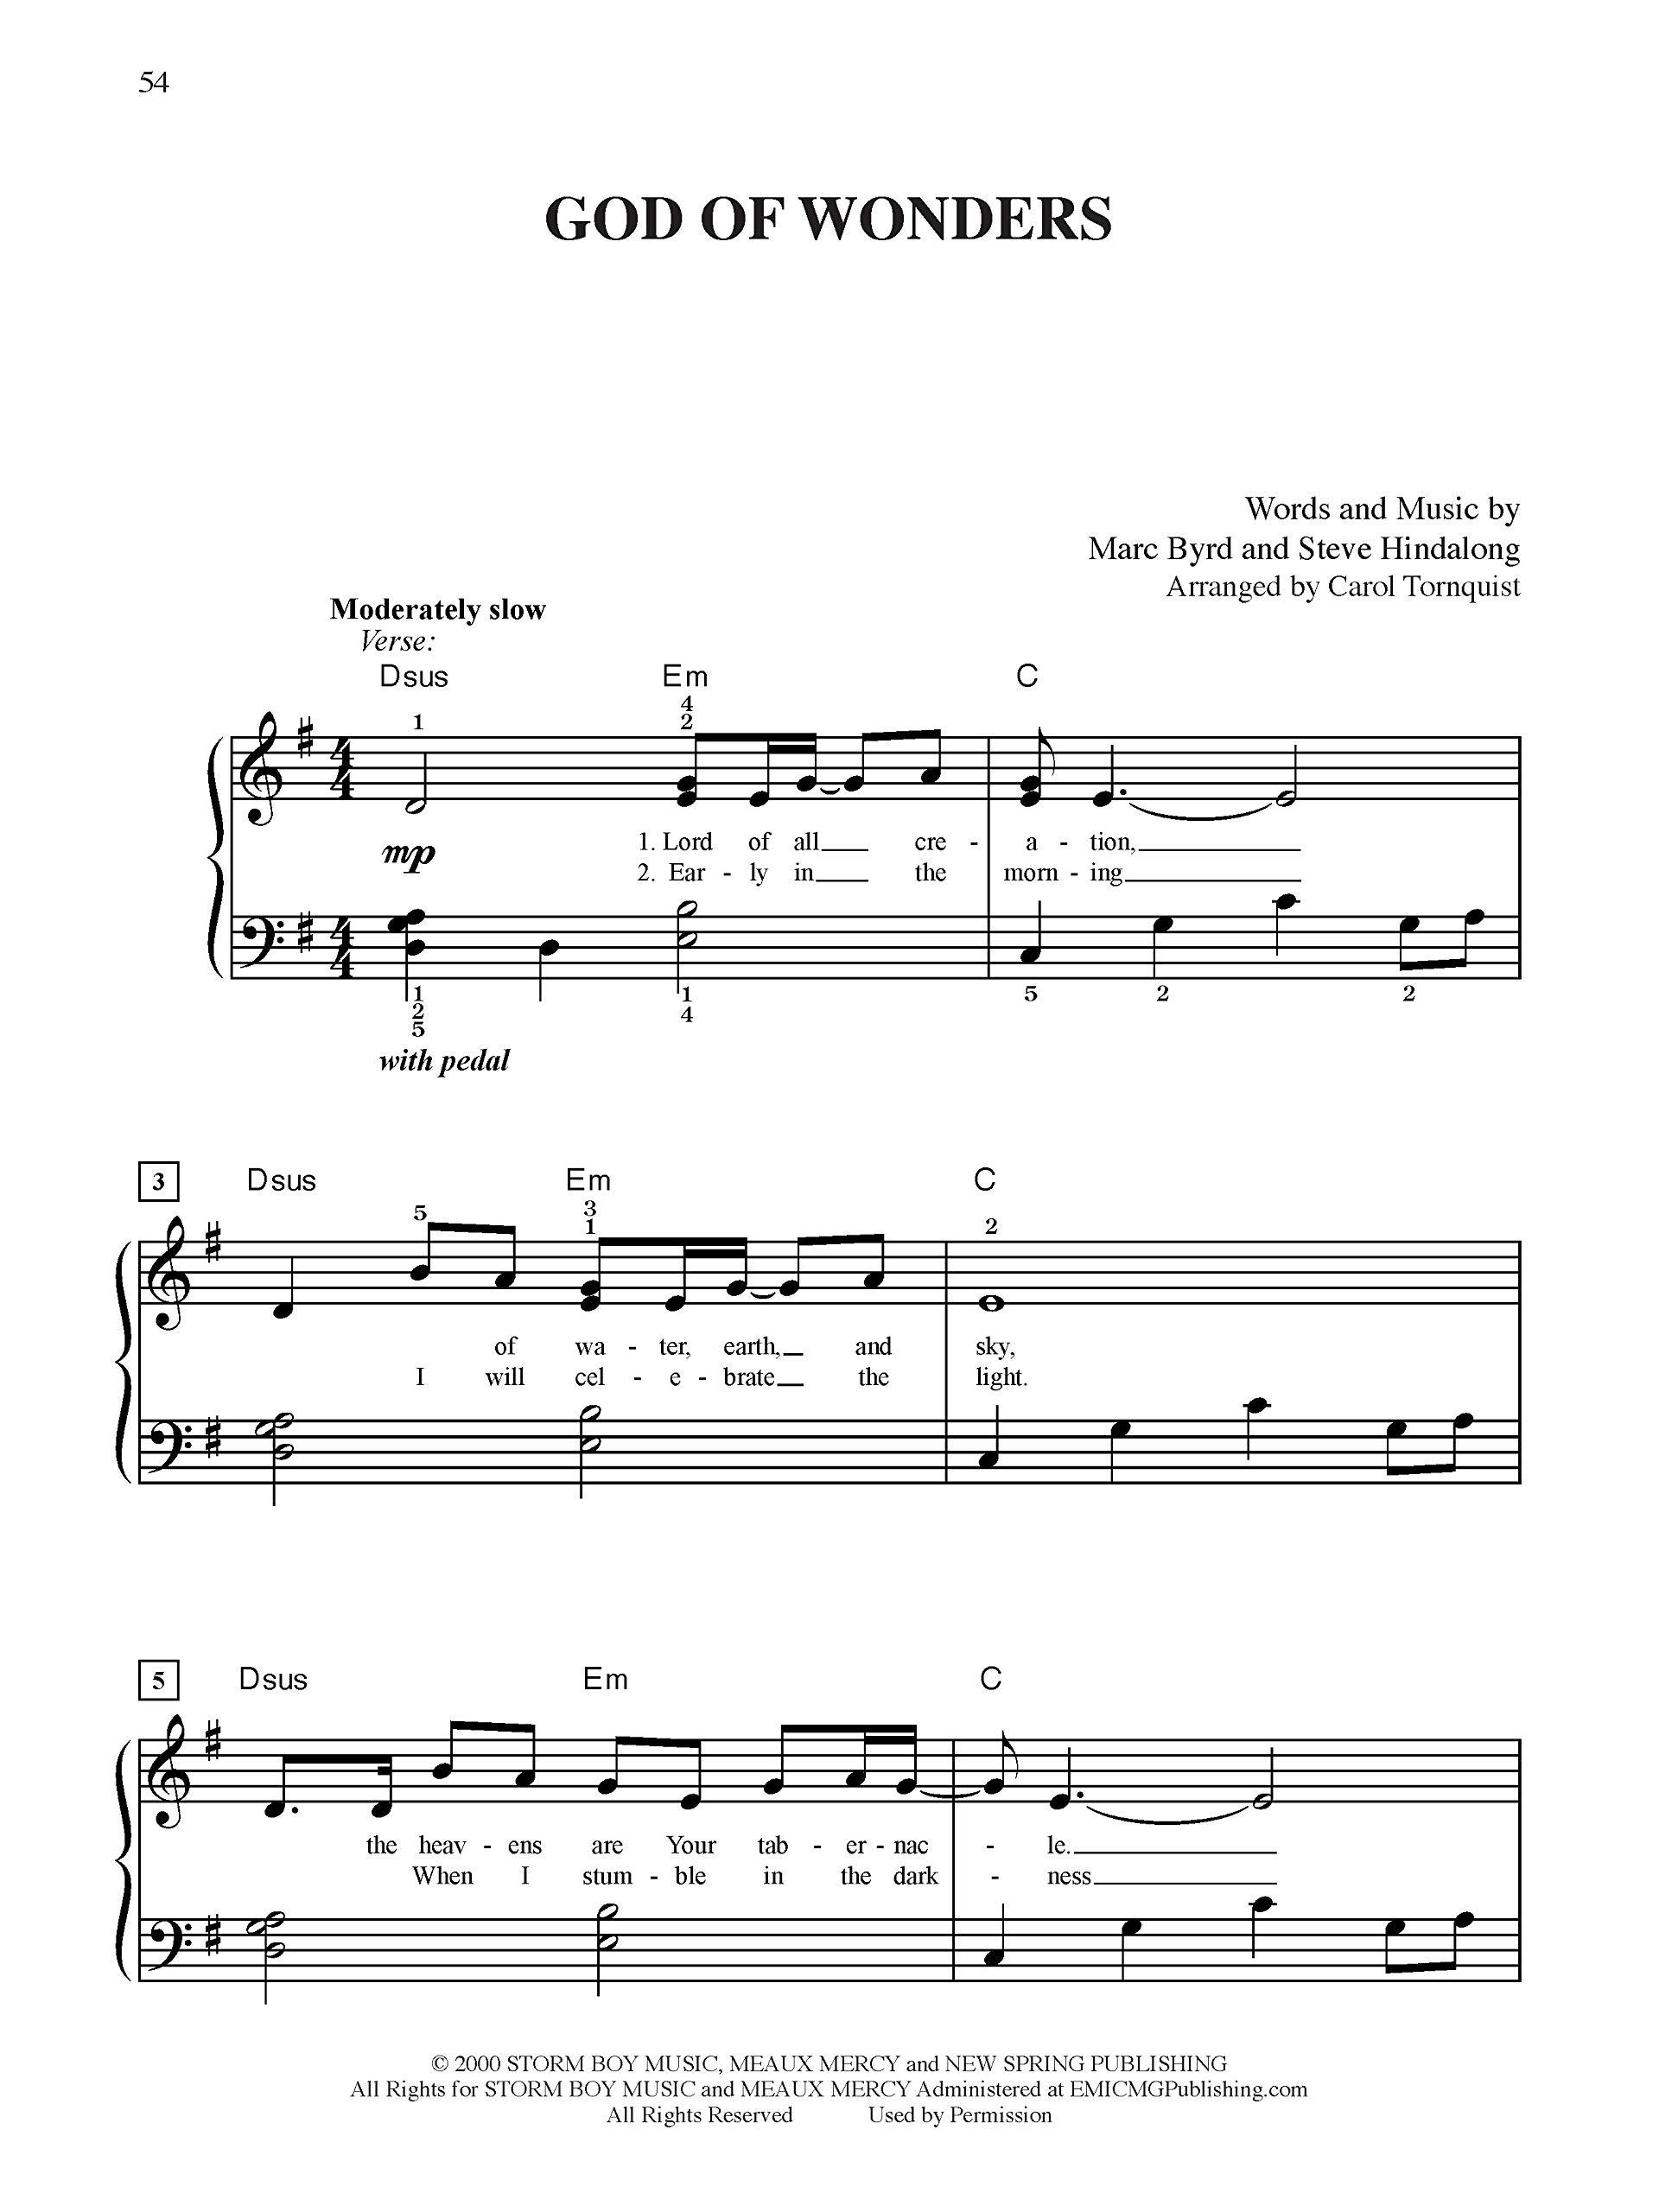 Top 50 Praise Worship Easy Piano Tornquist Carol 9780739091296 Amazon Com Books